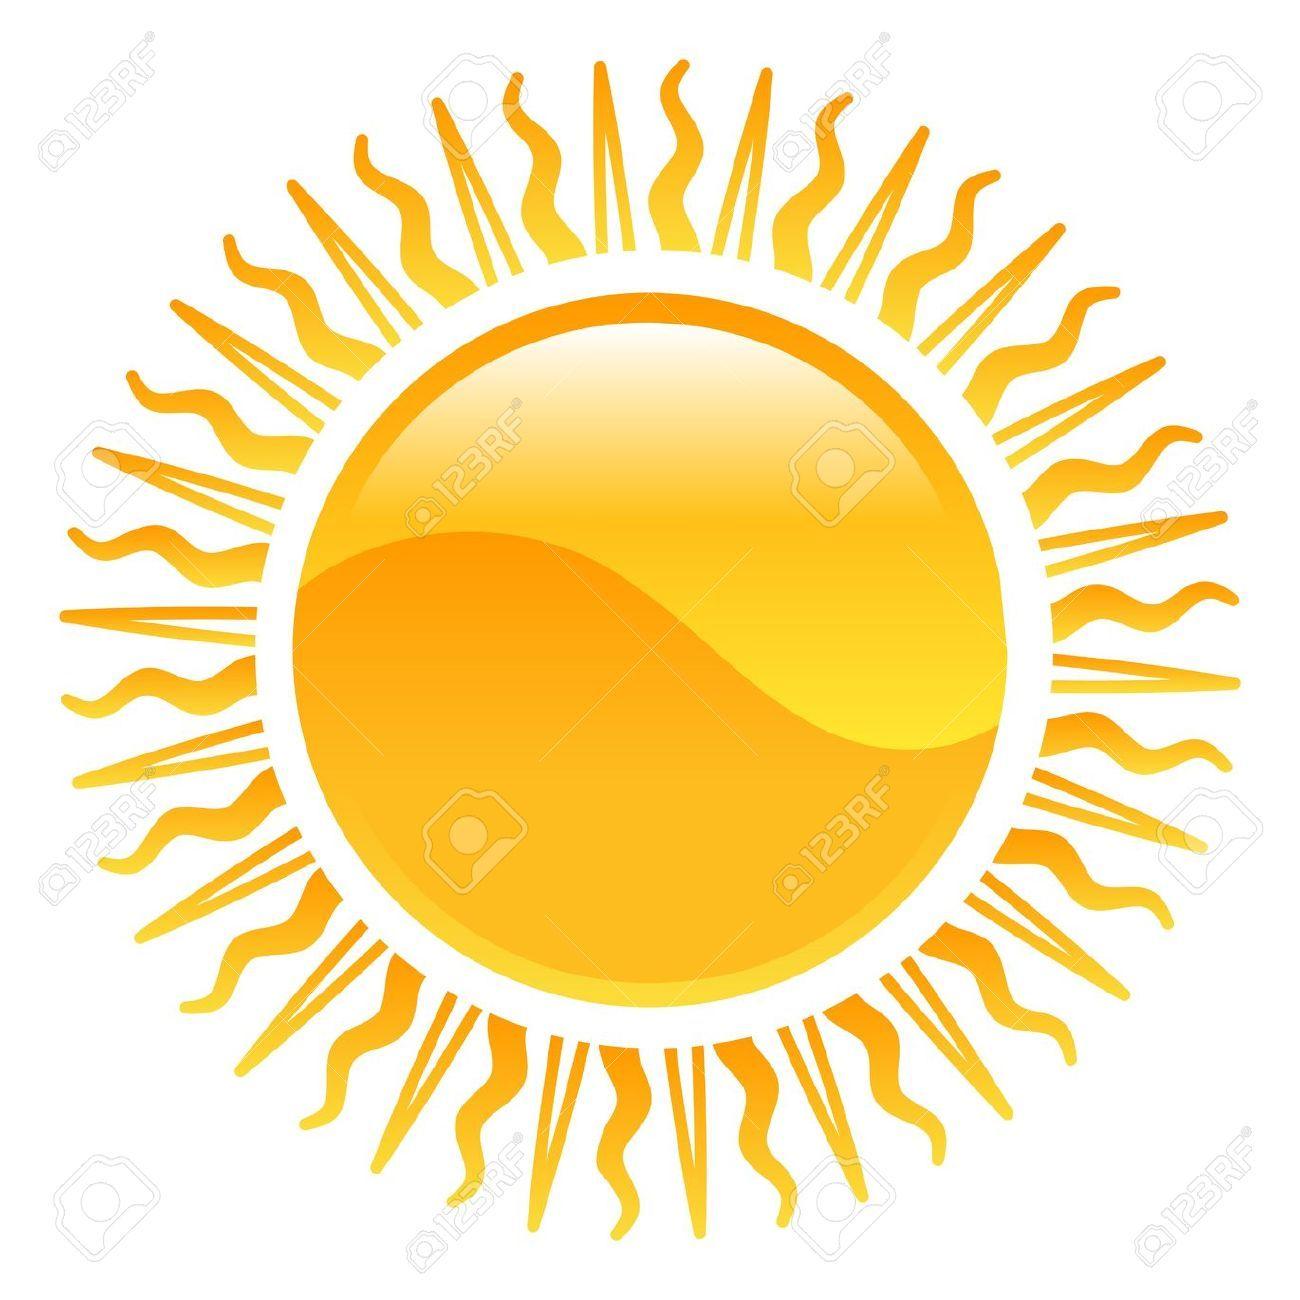 Stock Vector Sun illustration, Clip art, Weather icons